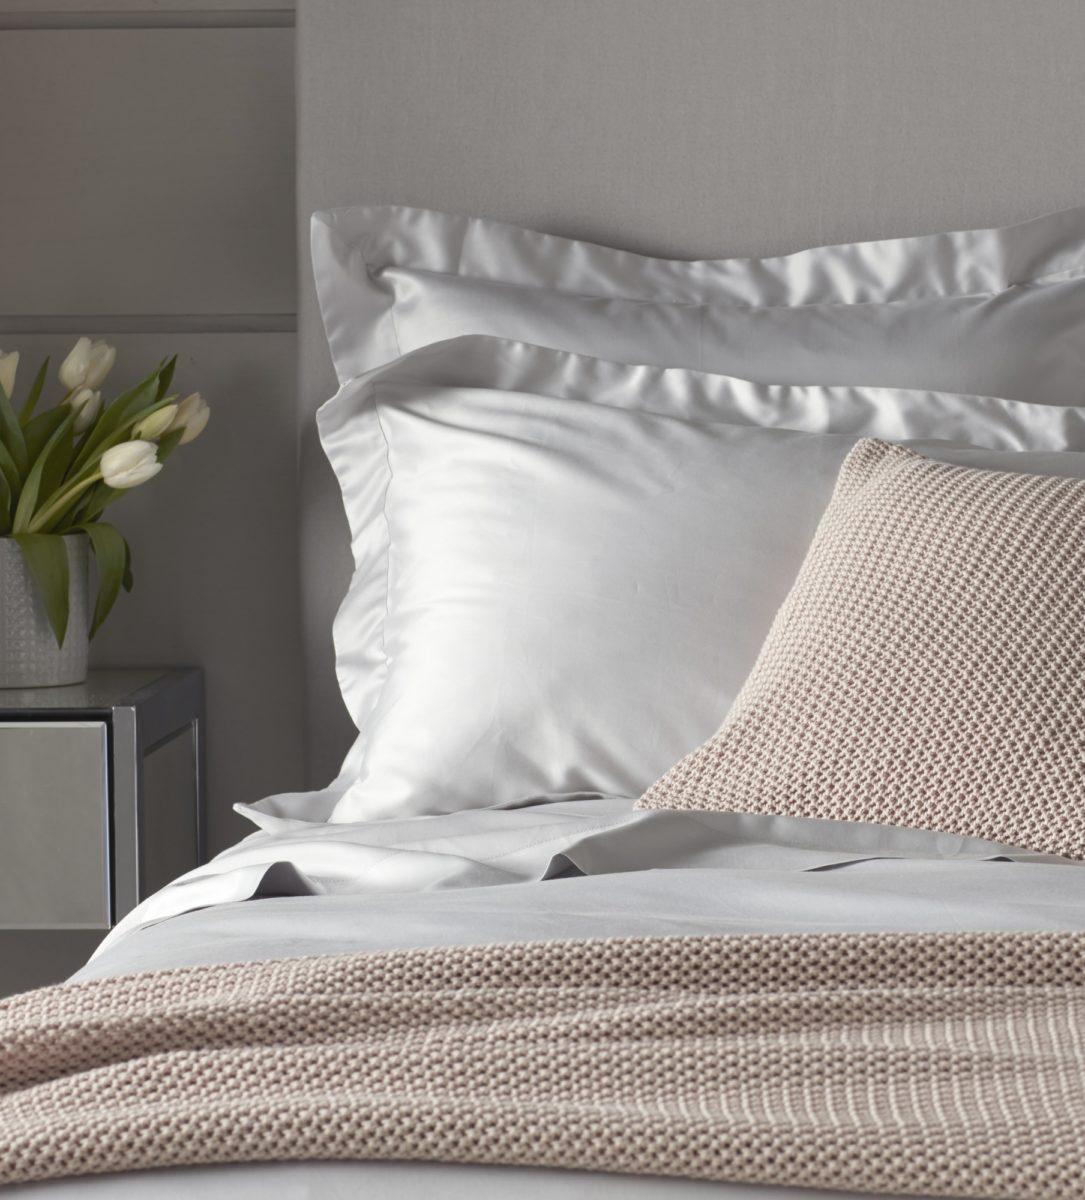 Luxury 600 Thread Count Oxford Pillowcases Light Grey | Secret Linen Store